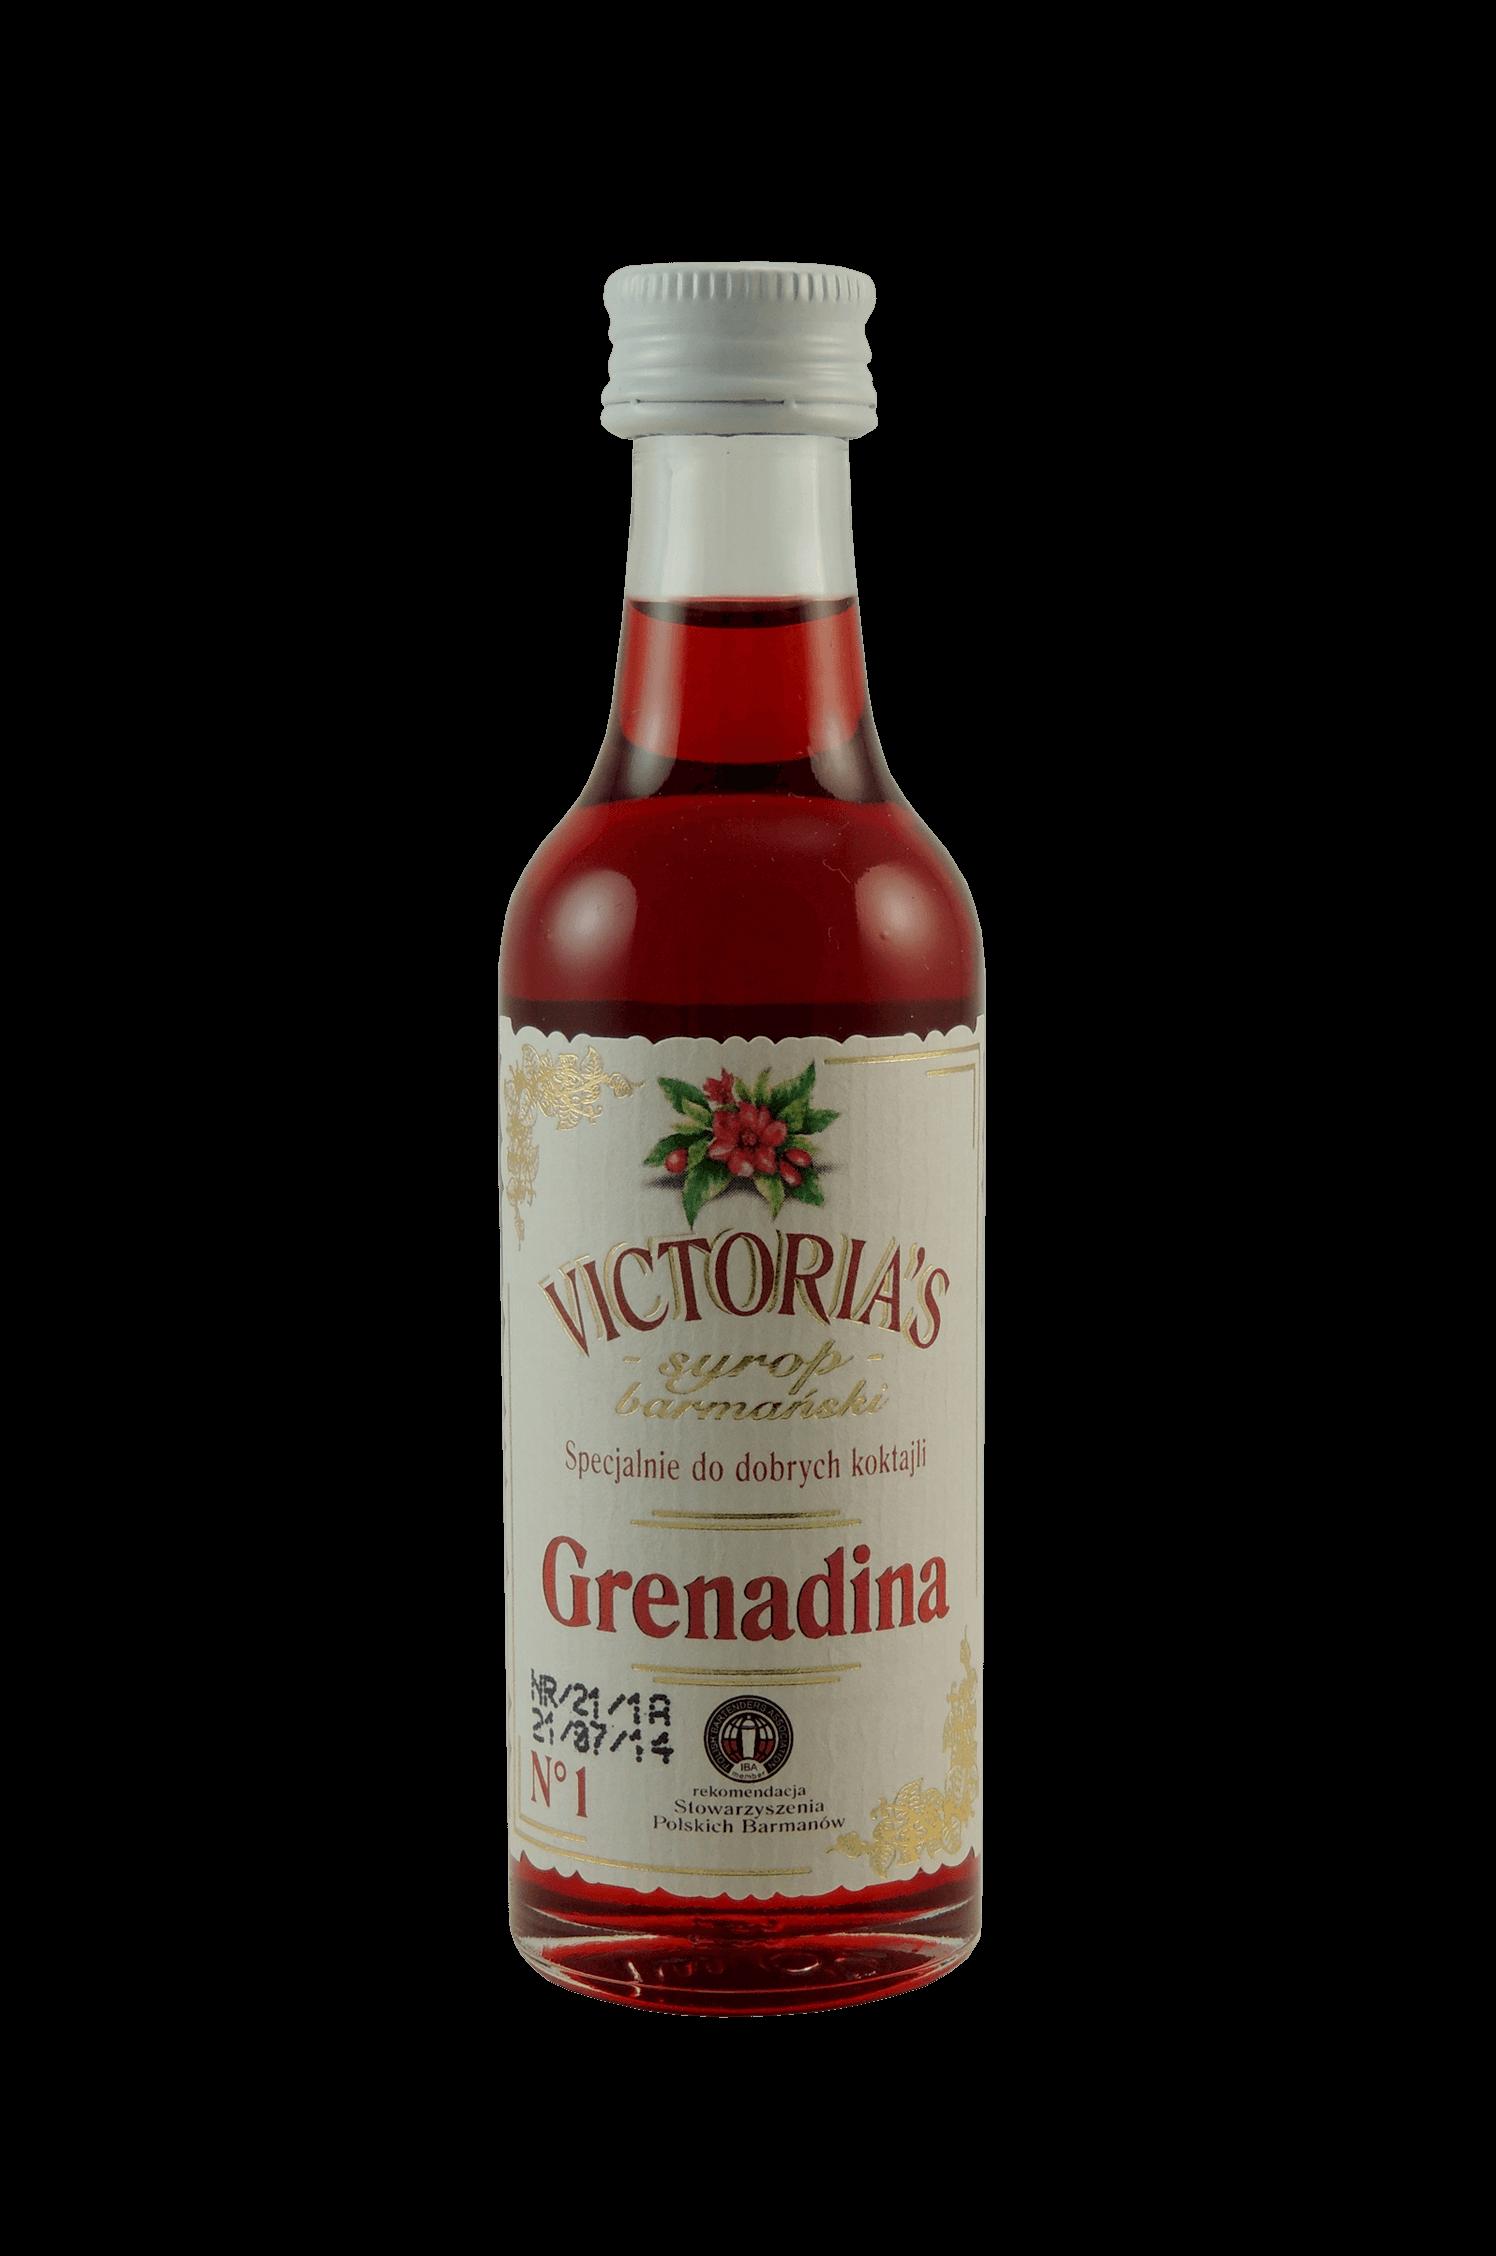 Victoria's Grenadina